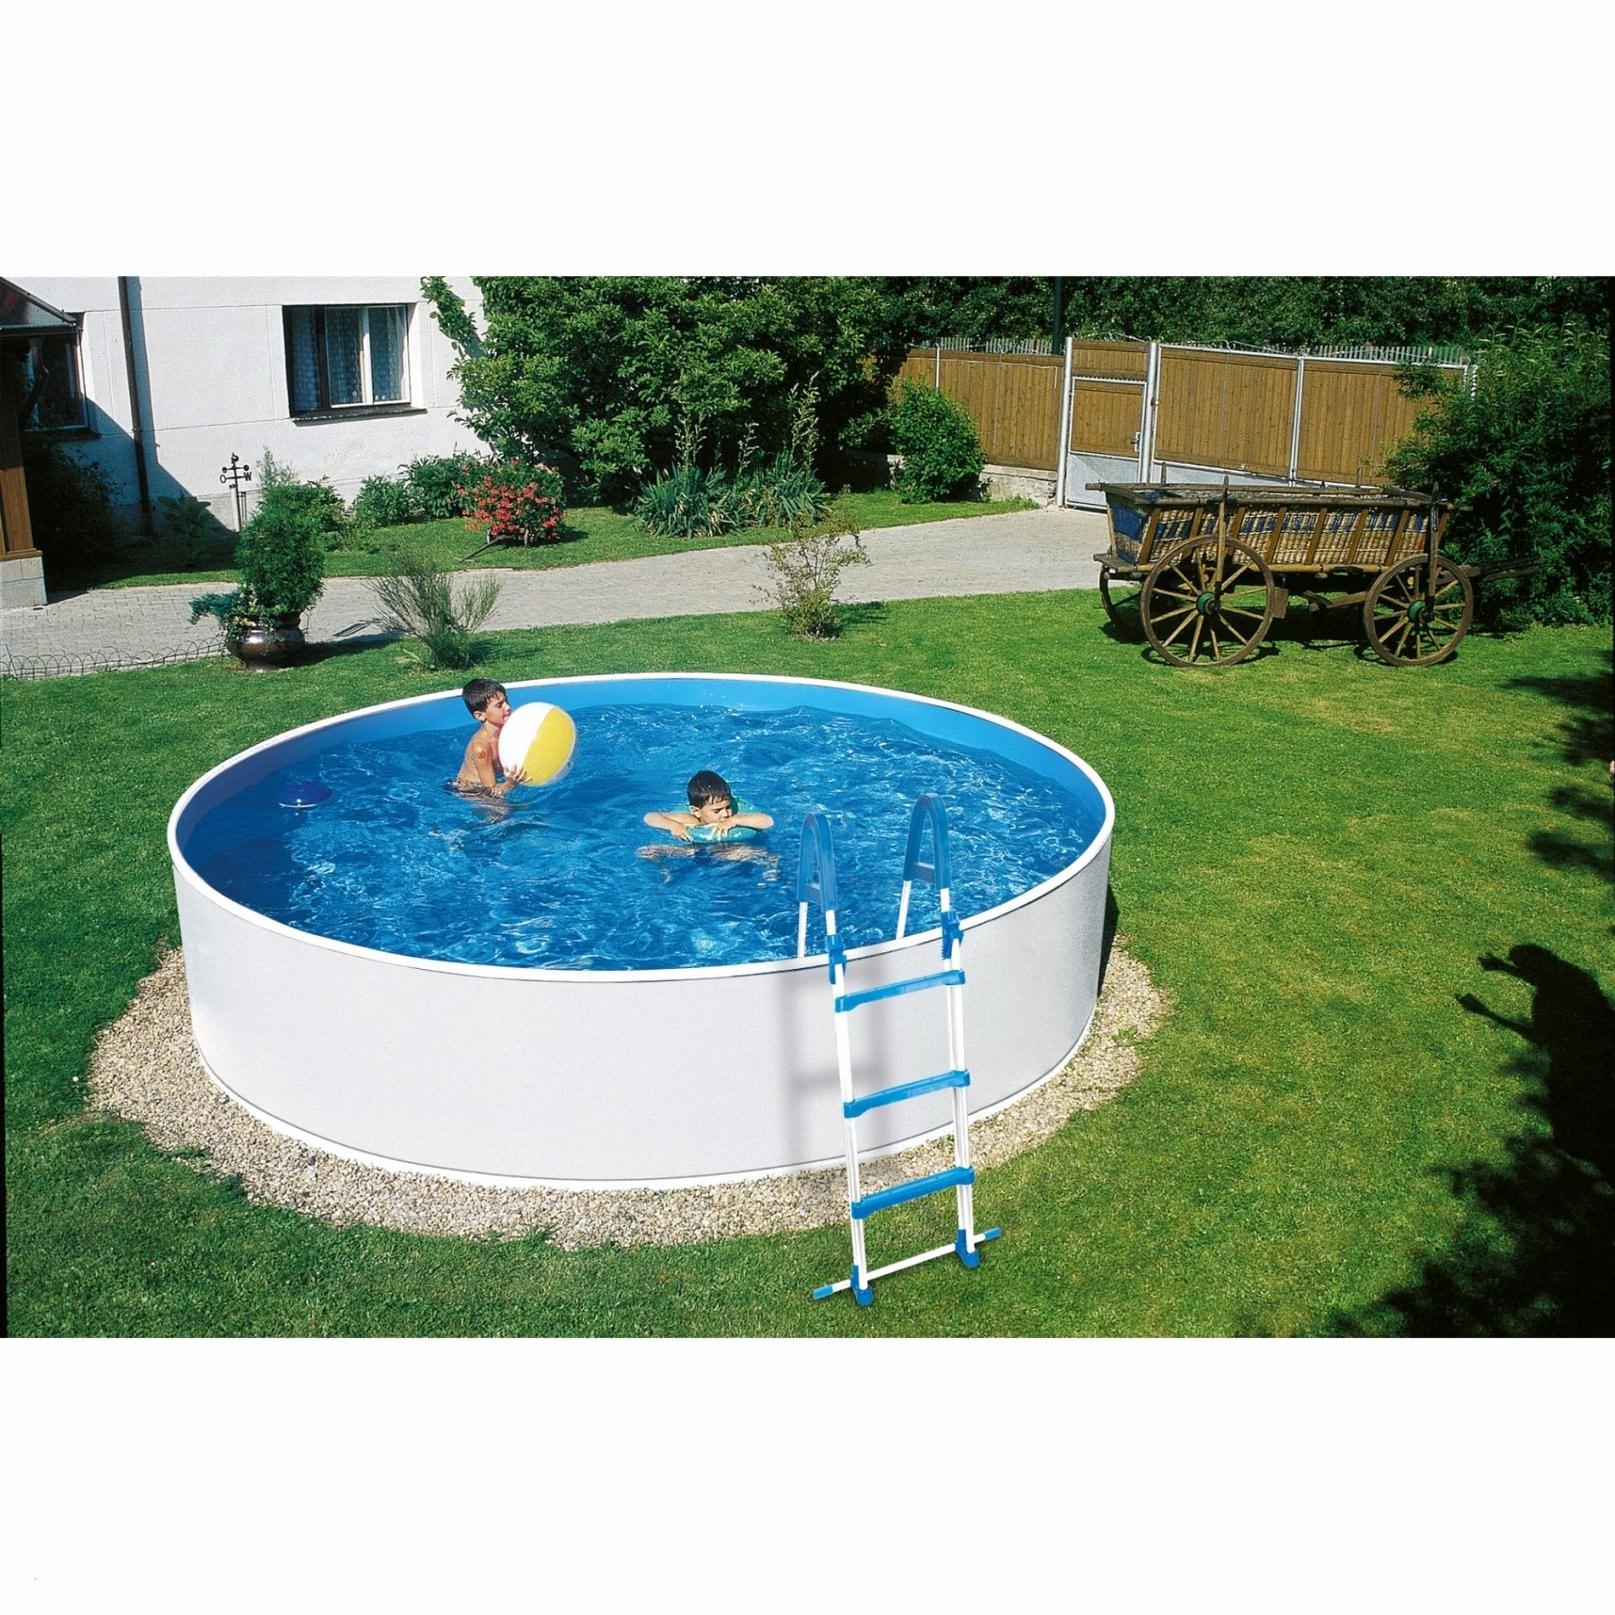 mini pool selber bauen frais pool garten selber bauen of mini pool selber bauen